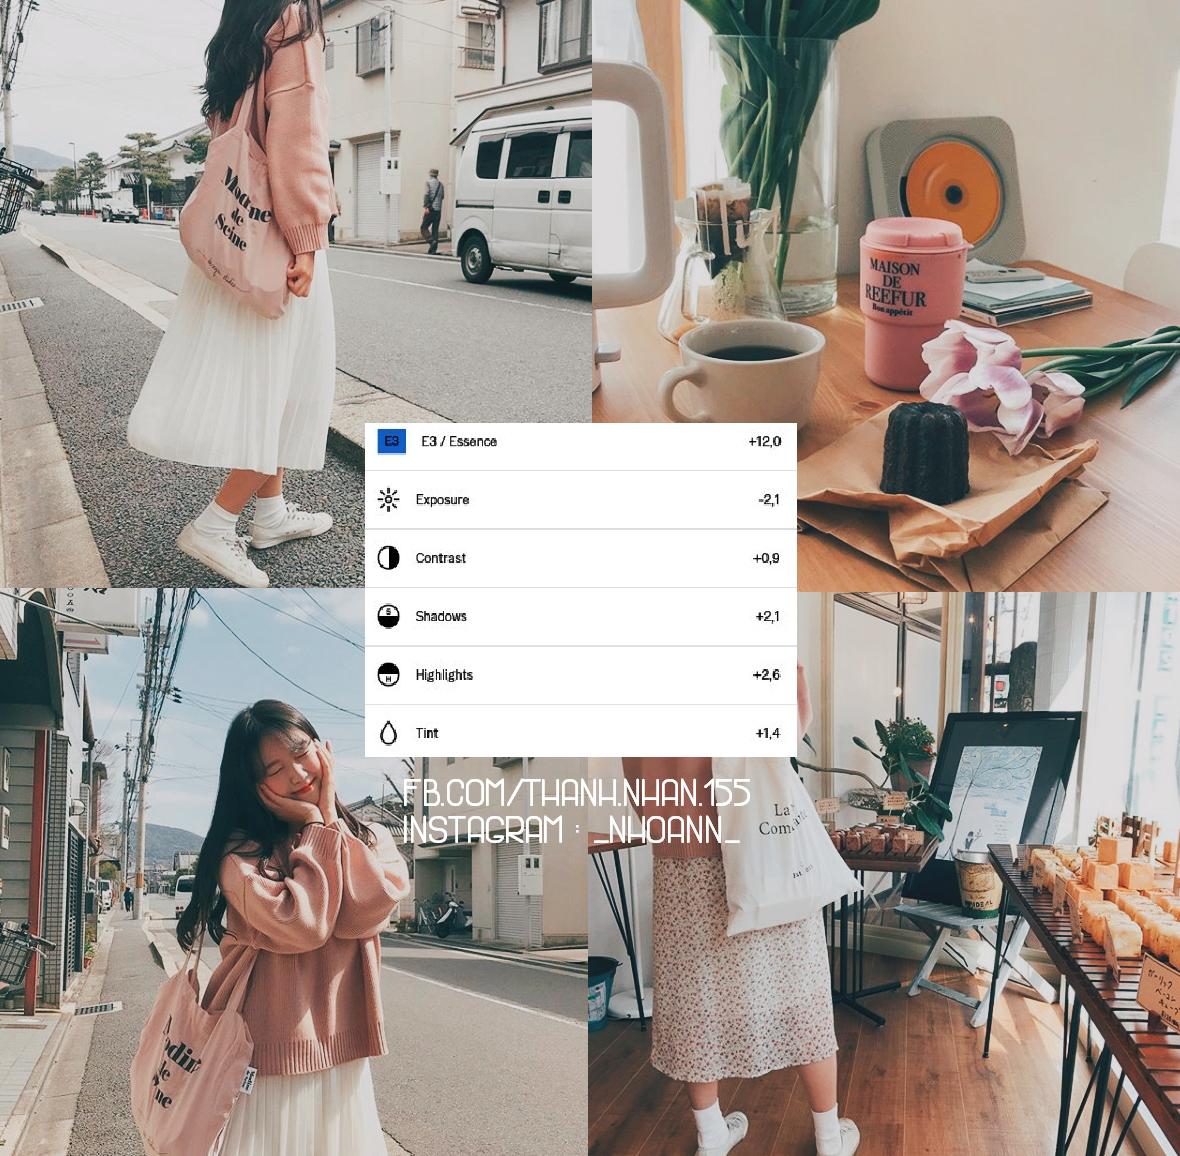 Как редактируют фото в инстаграм